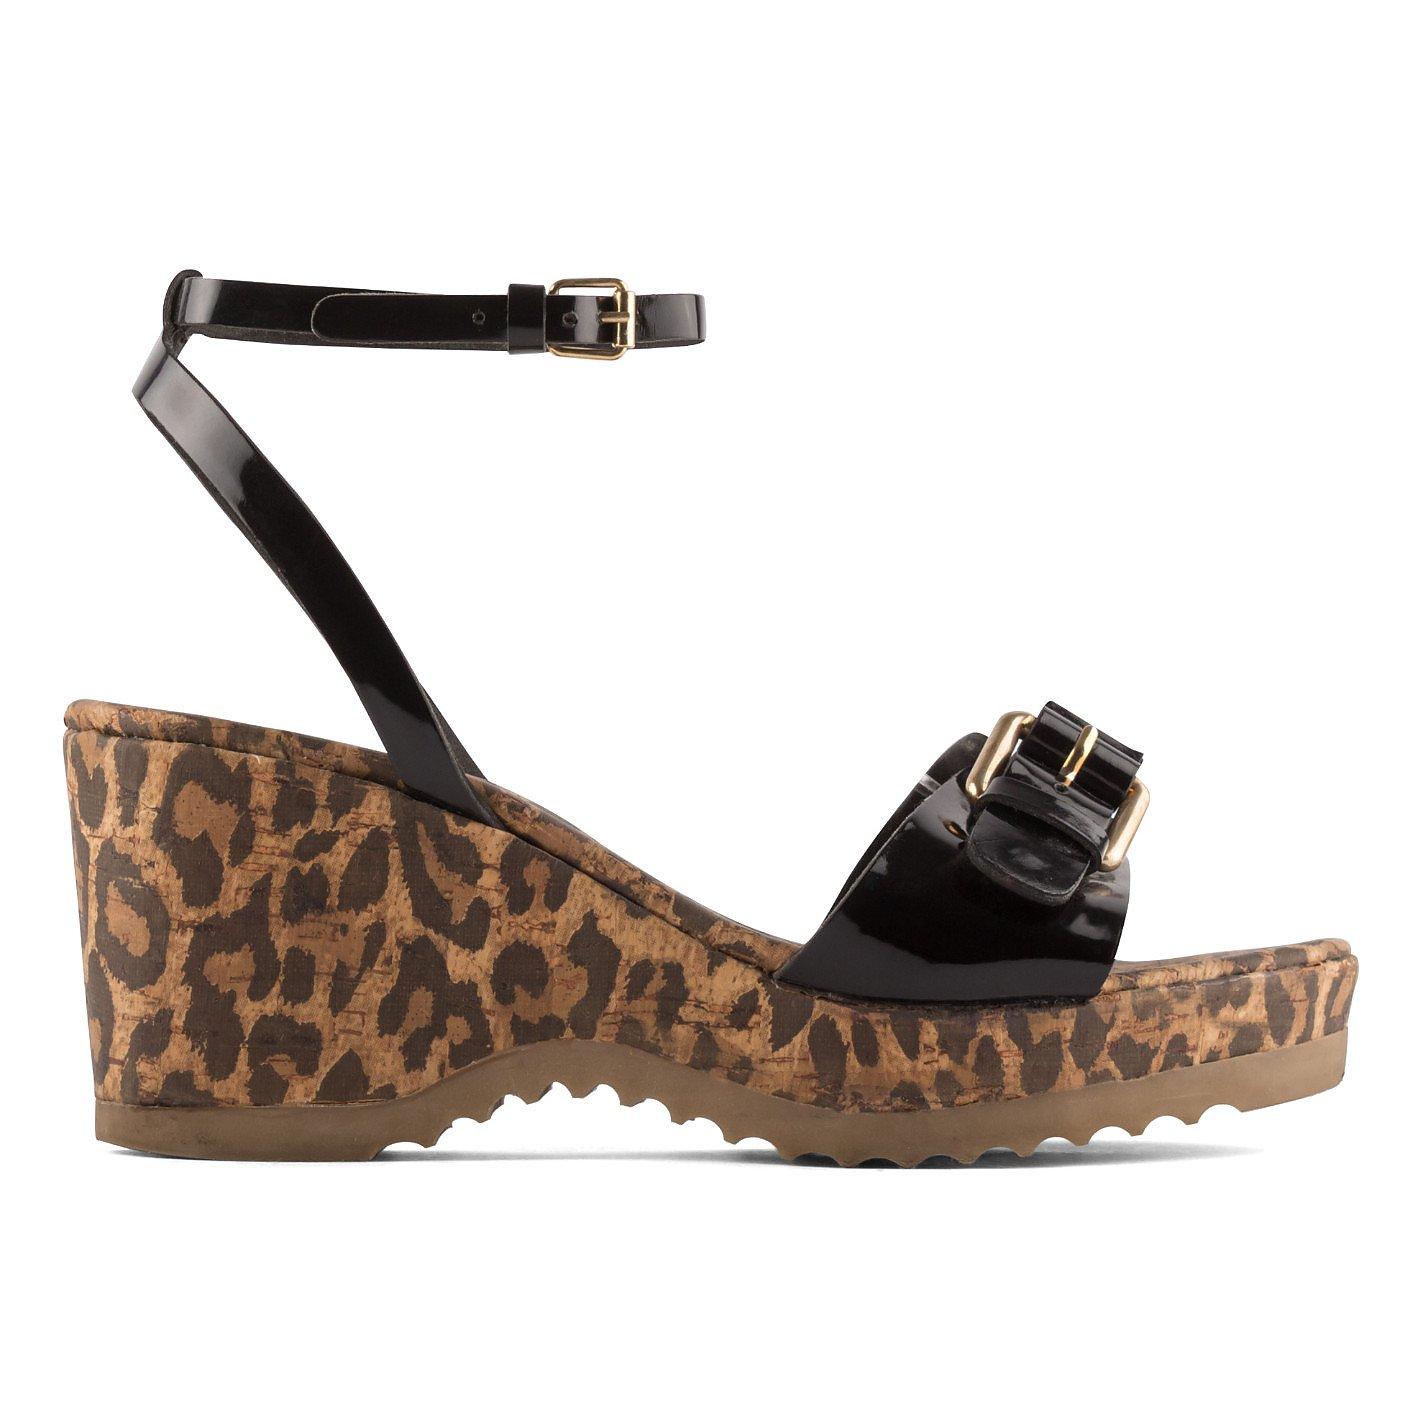 Stella McCartney Linda Leopard Print Cork Wedge Sandals